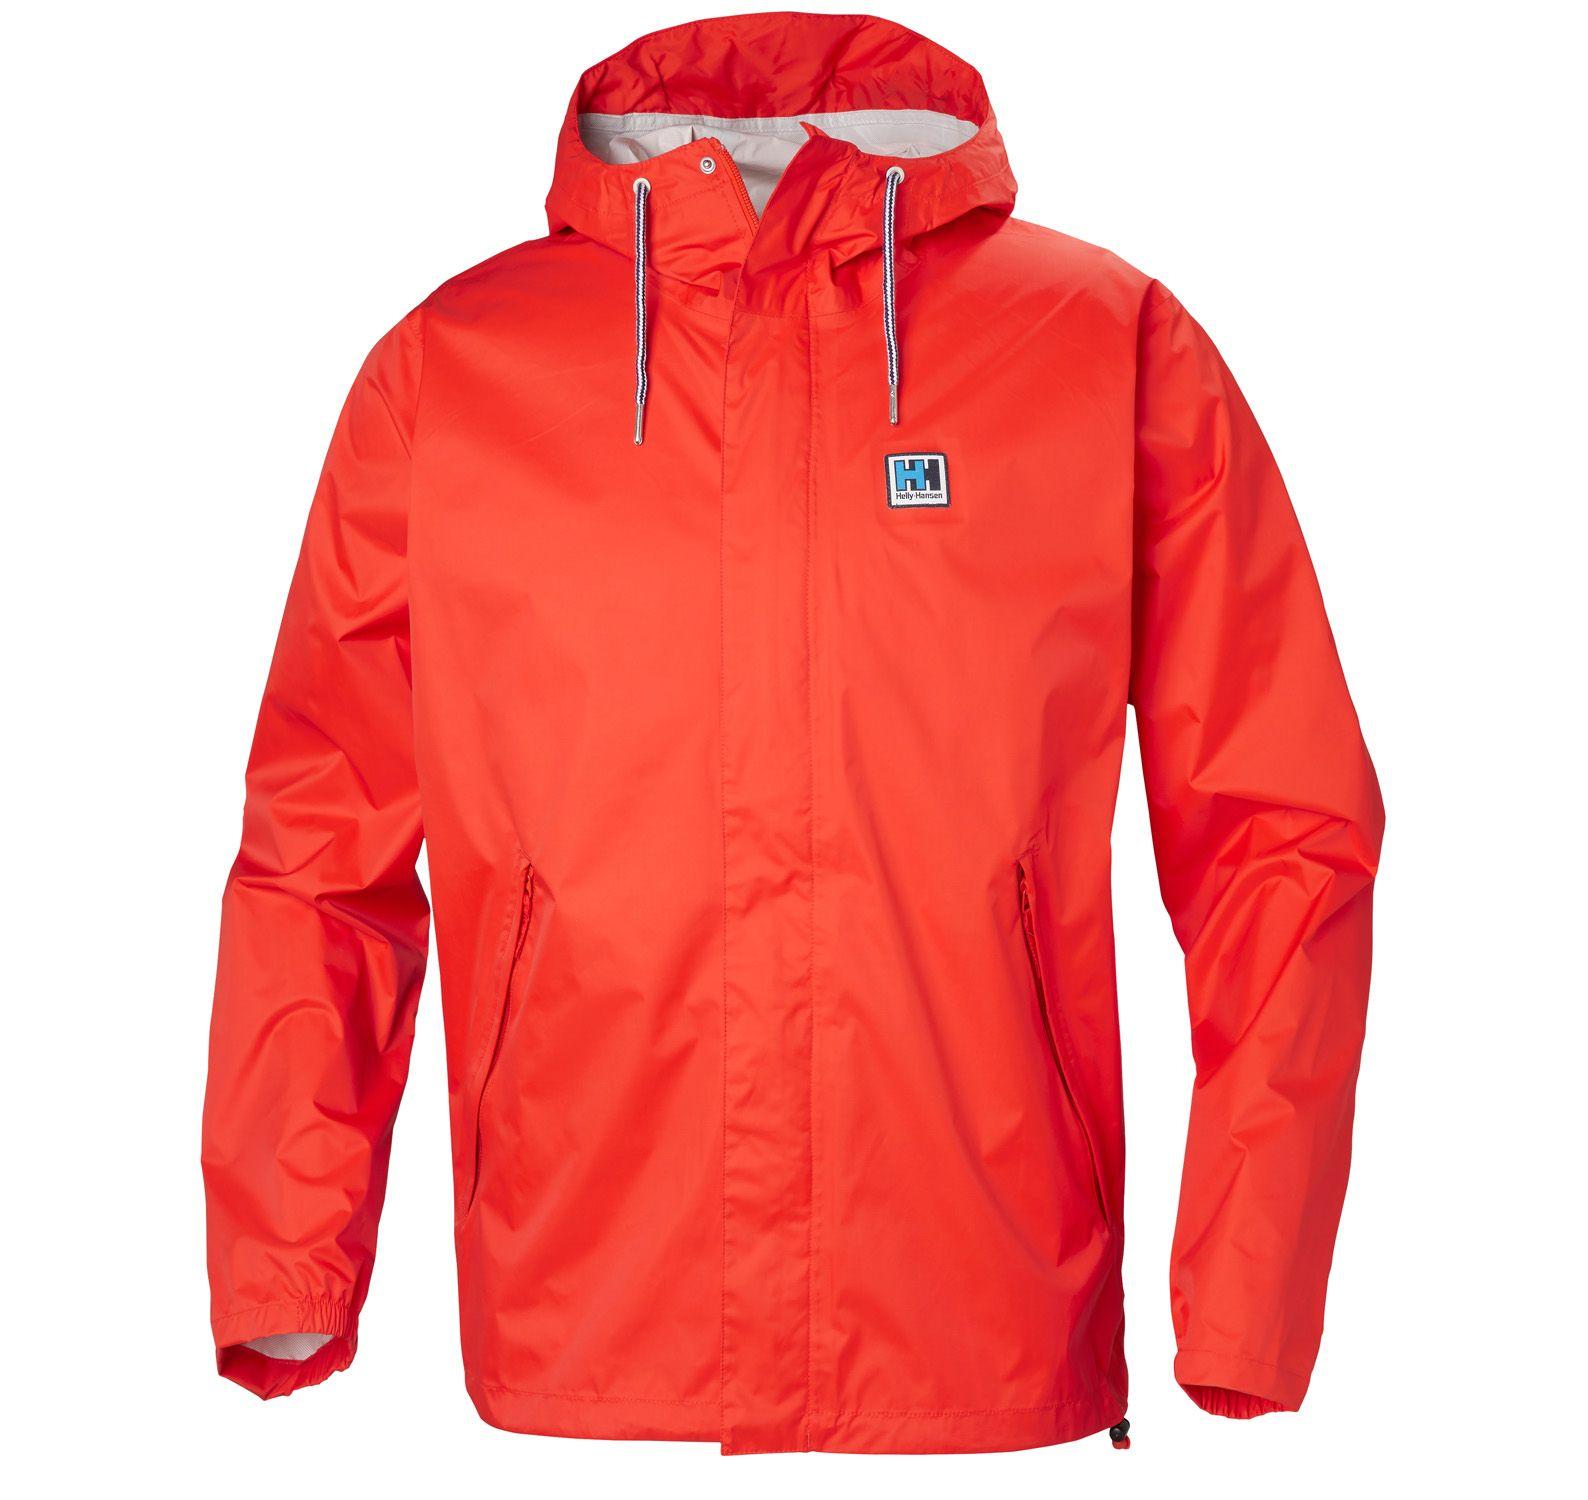 hh mountain jacket, 135 grenadine, l, regnjackor